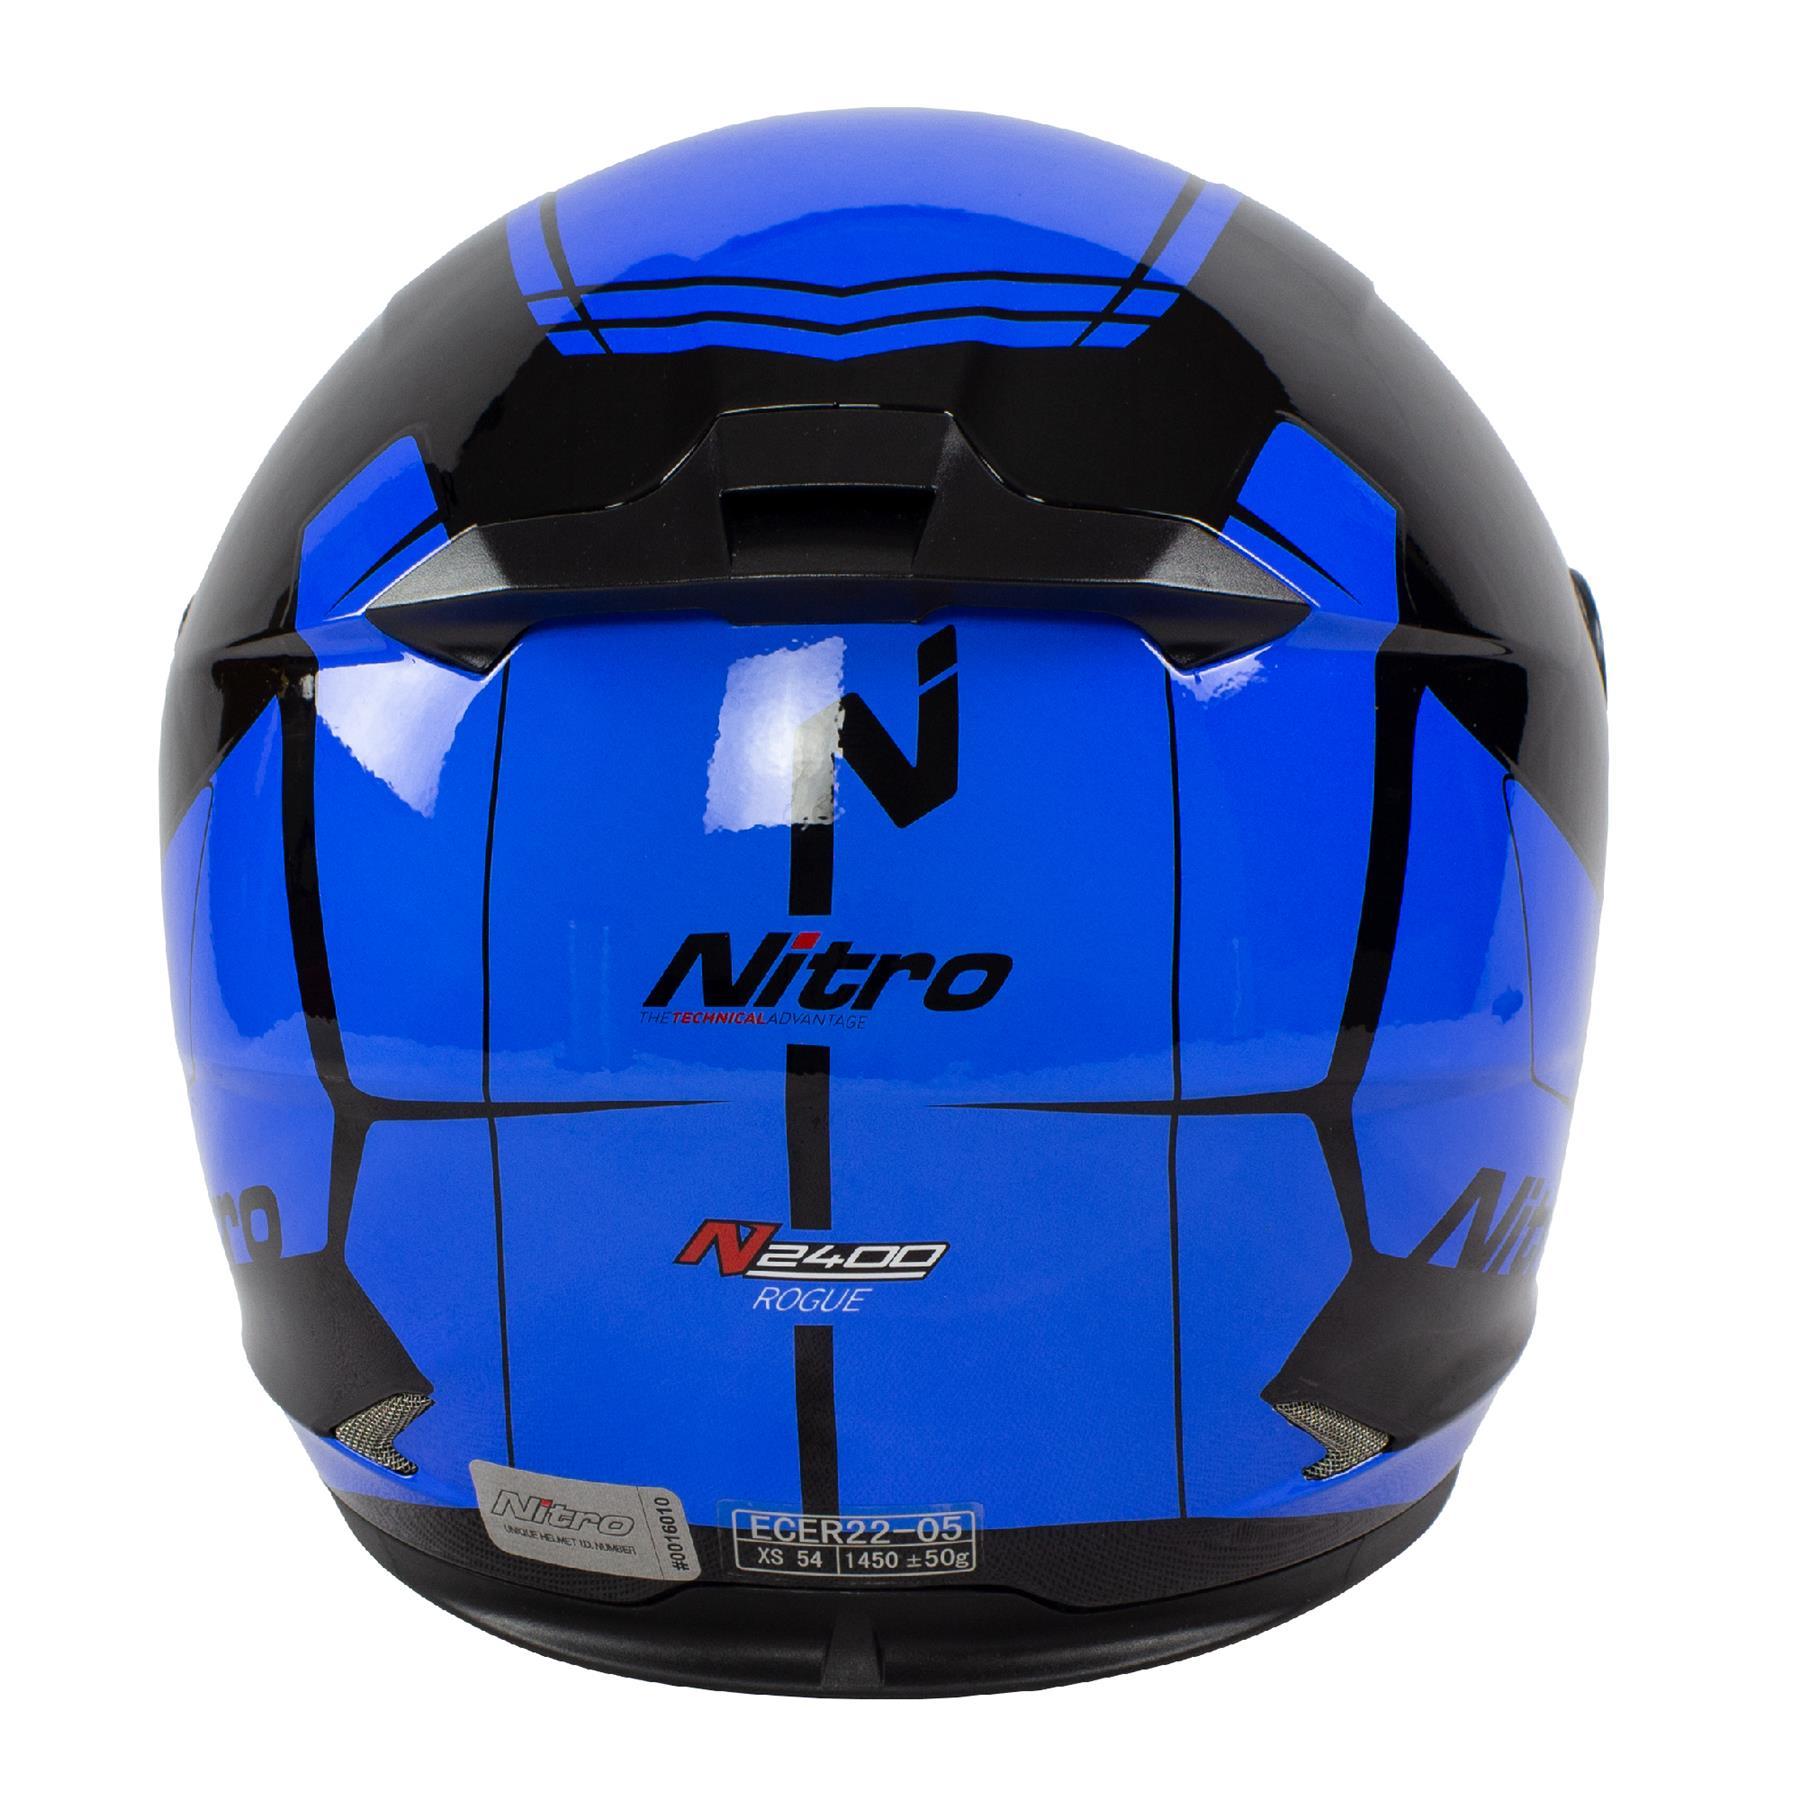 Nitro-N2400-Rogue-Full-Face-Motorcycle-Motorbike-Crash-Helmet-Black-Blue-Red thumbnail 12